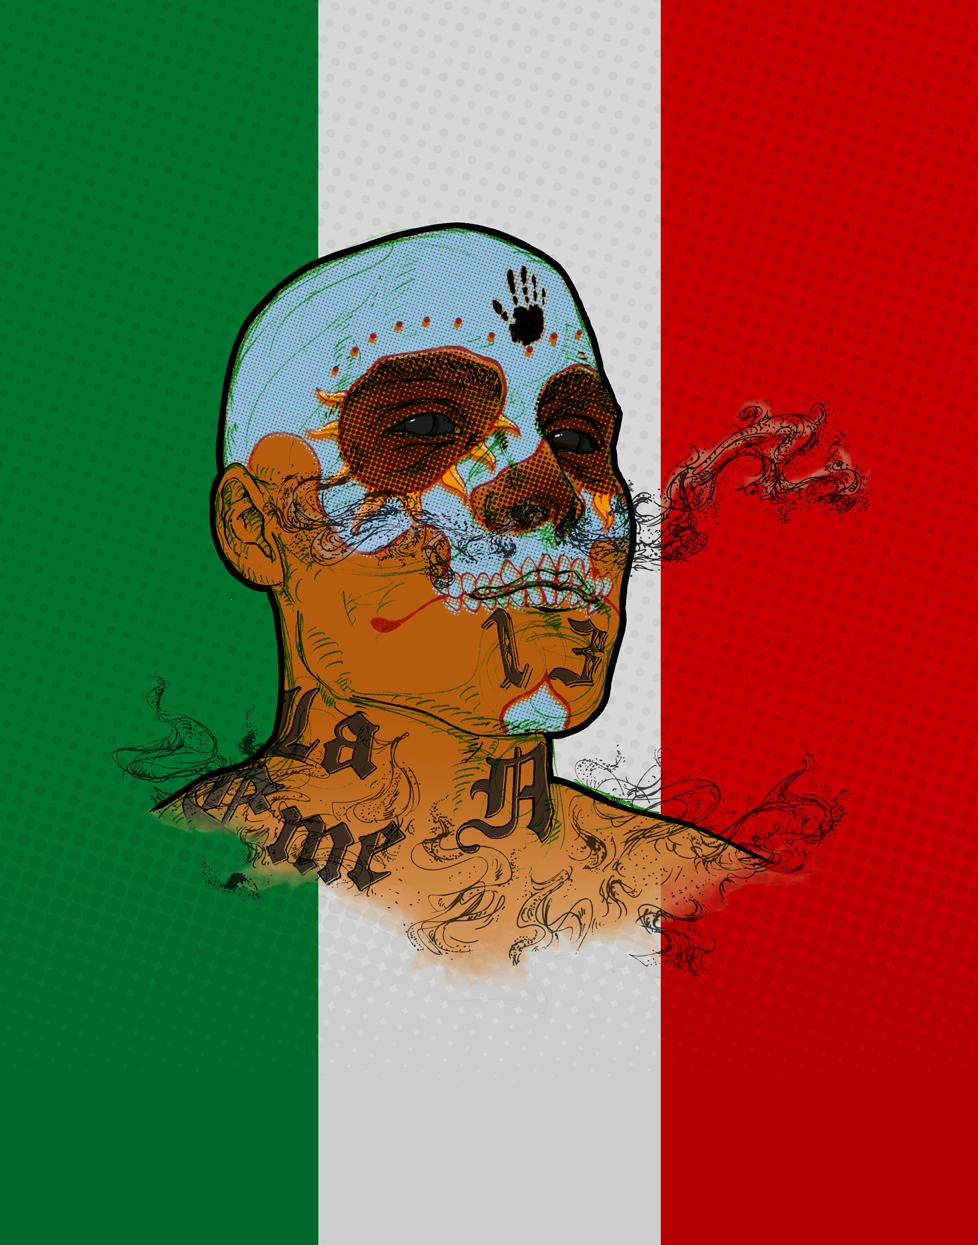 First Commandment:  Mexican Mafia